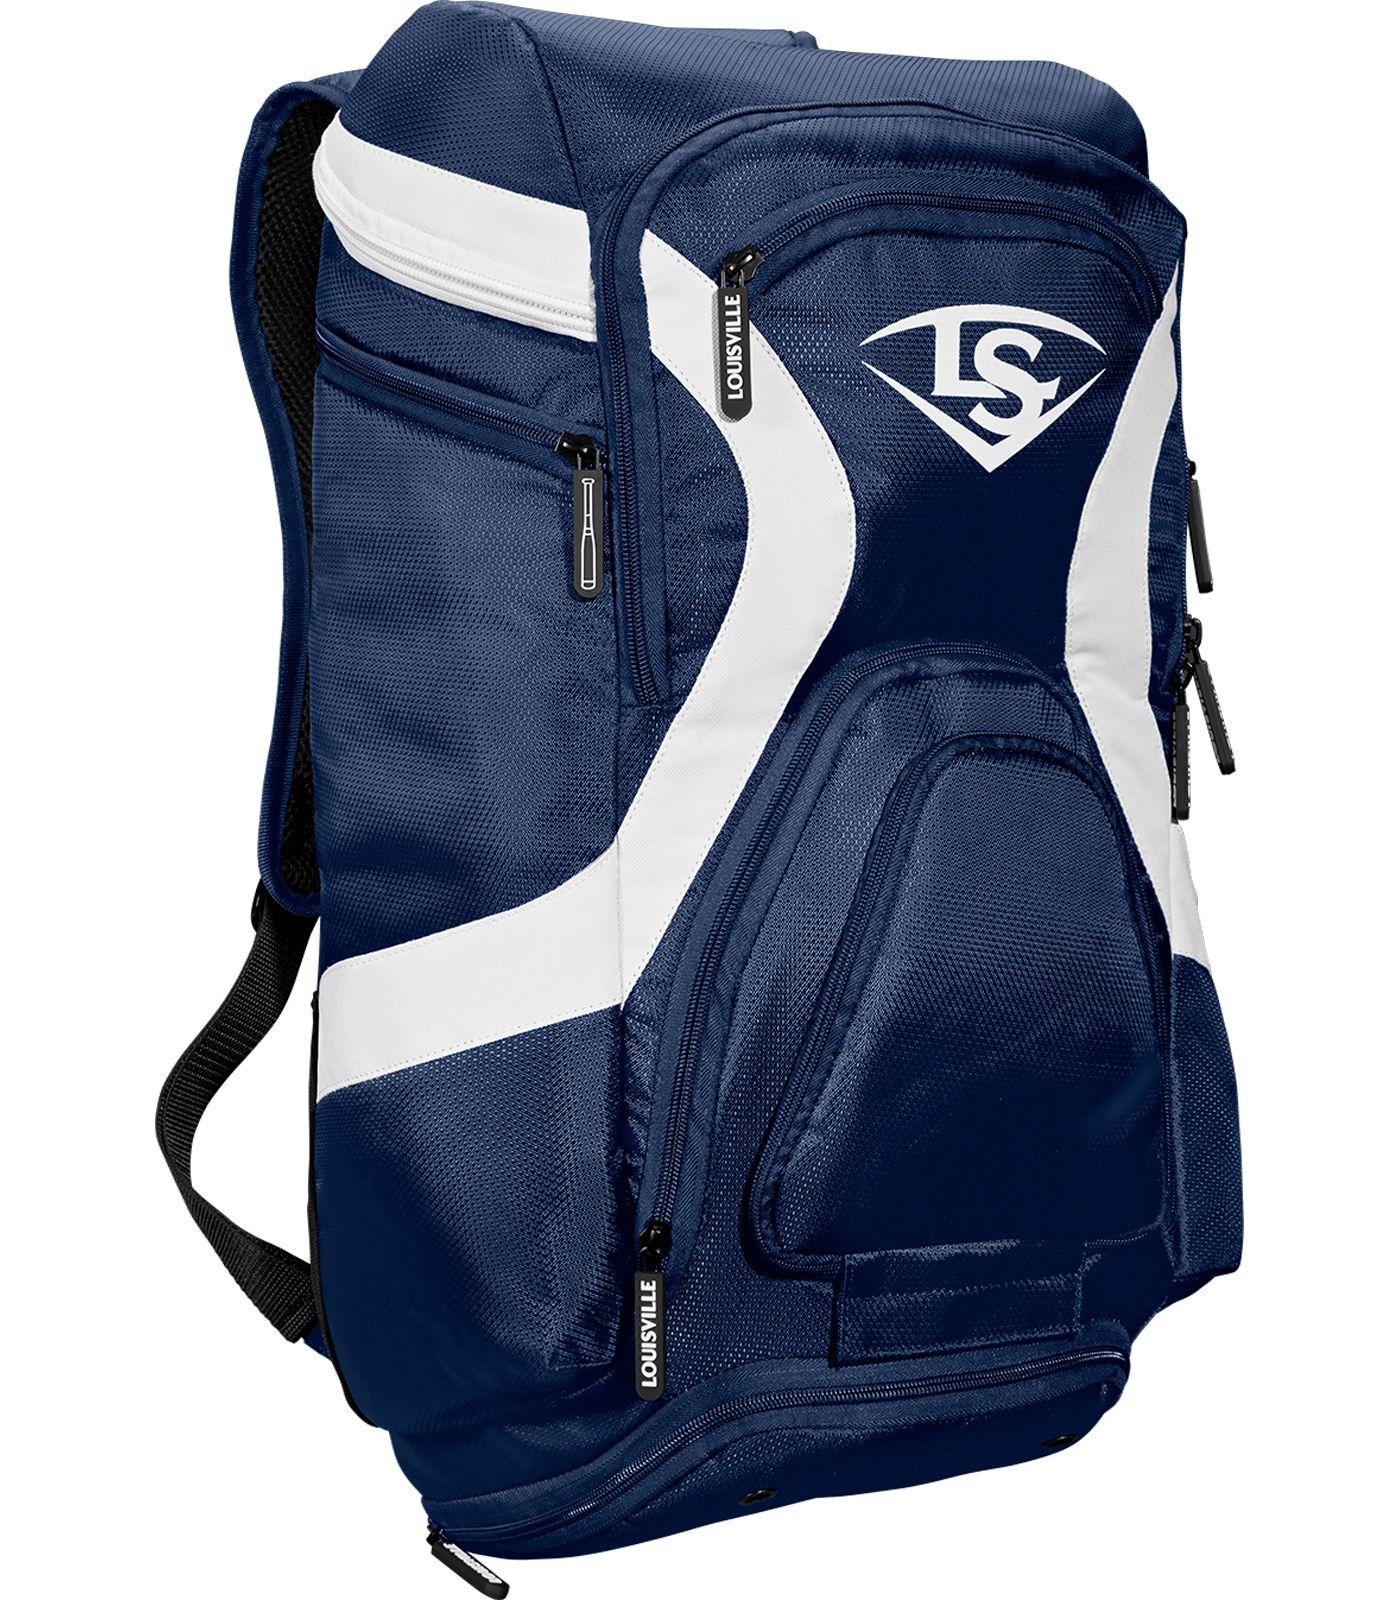 Louisville Slugger M9 Baseball Bat Pack